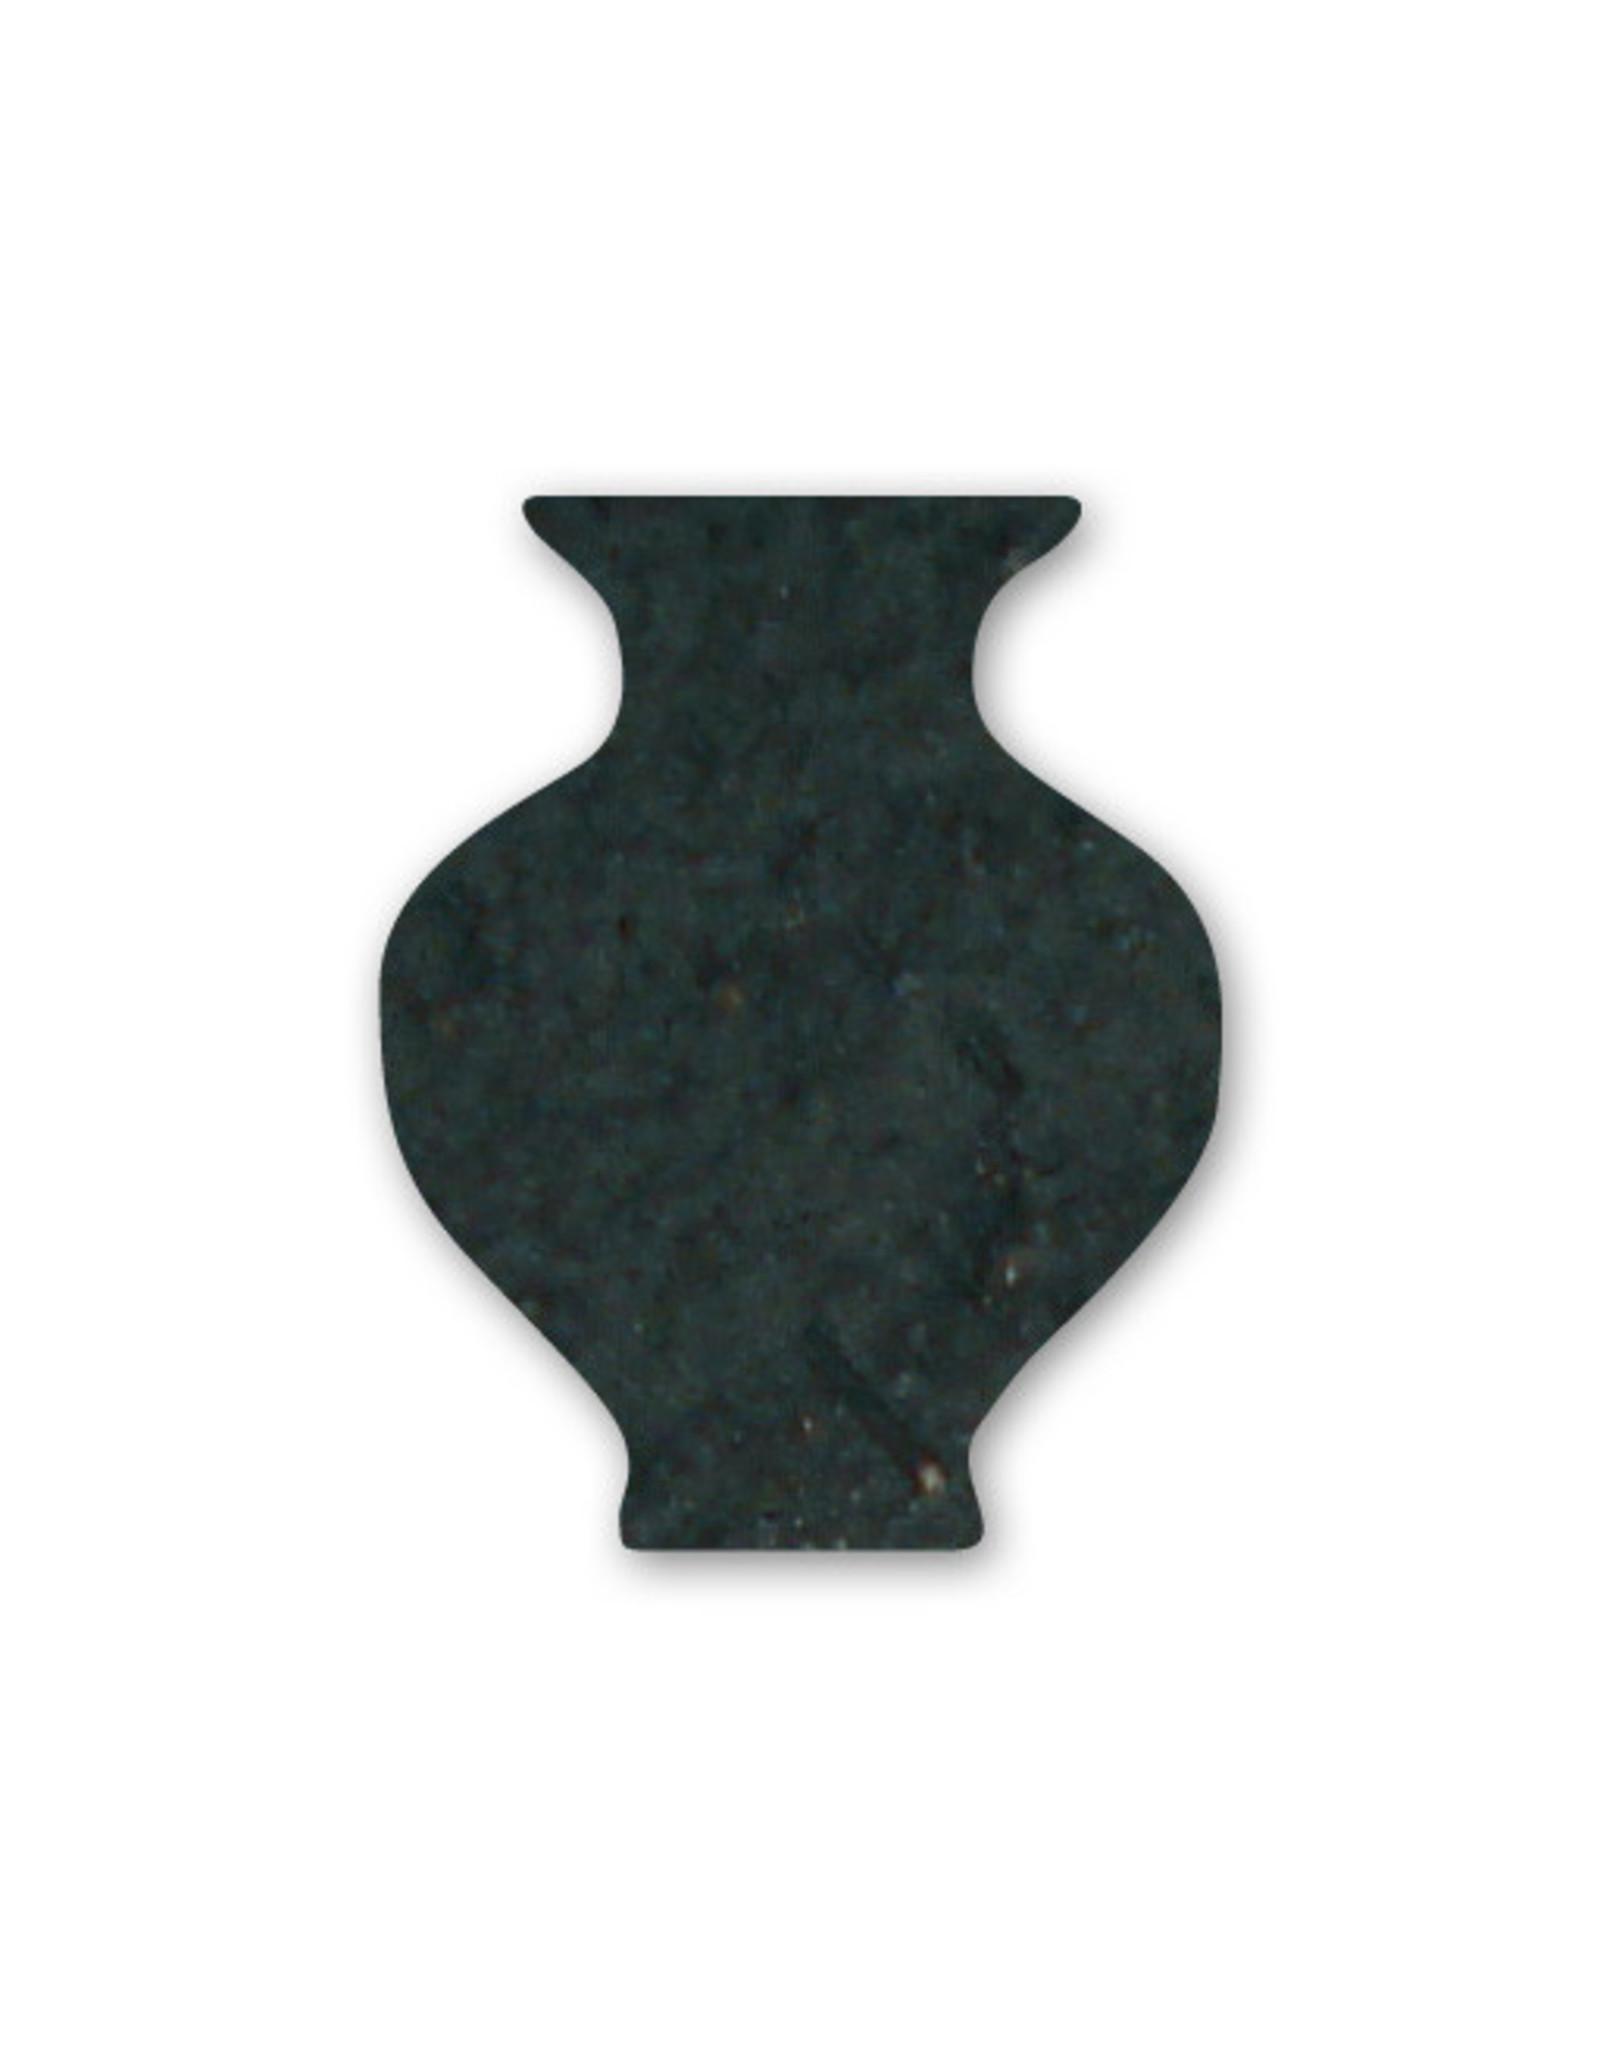 Scarva PF670 Smooth Textured Black (Firing Range 1080˚C-1260˚C) - 12.5kg